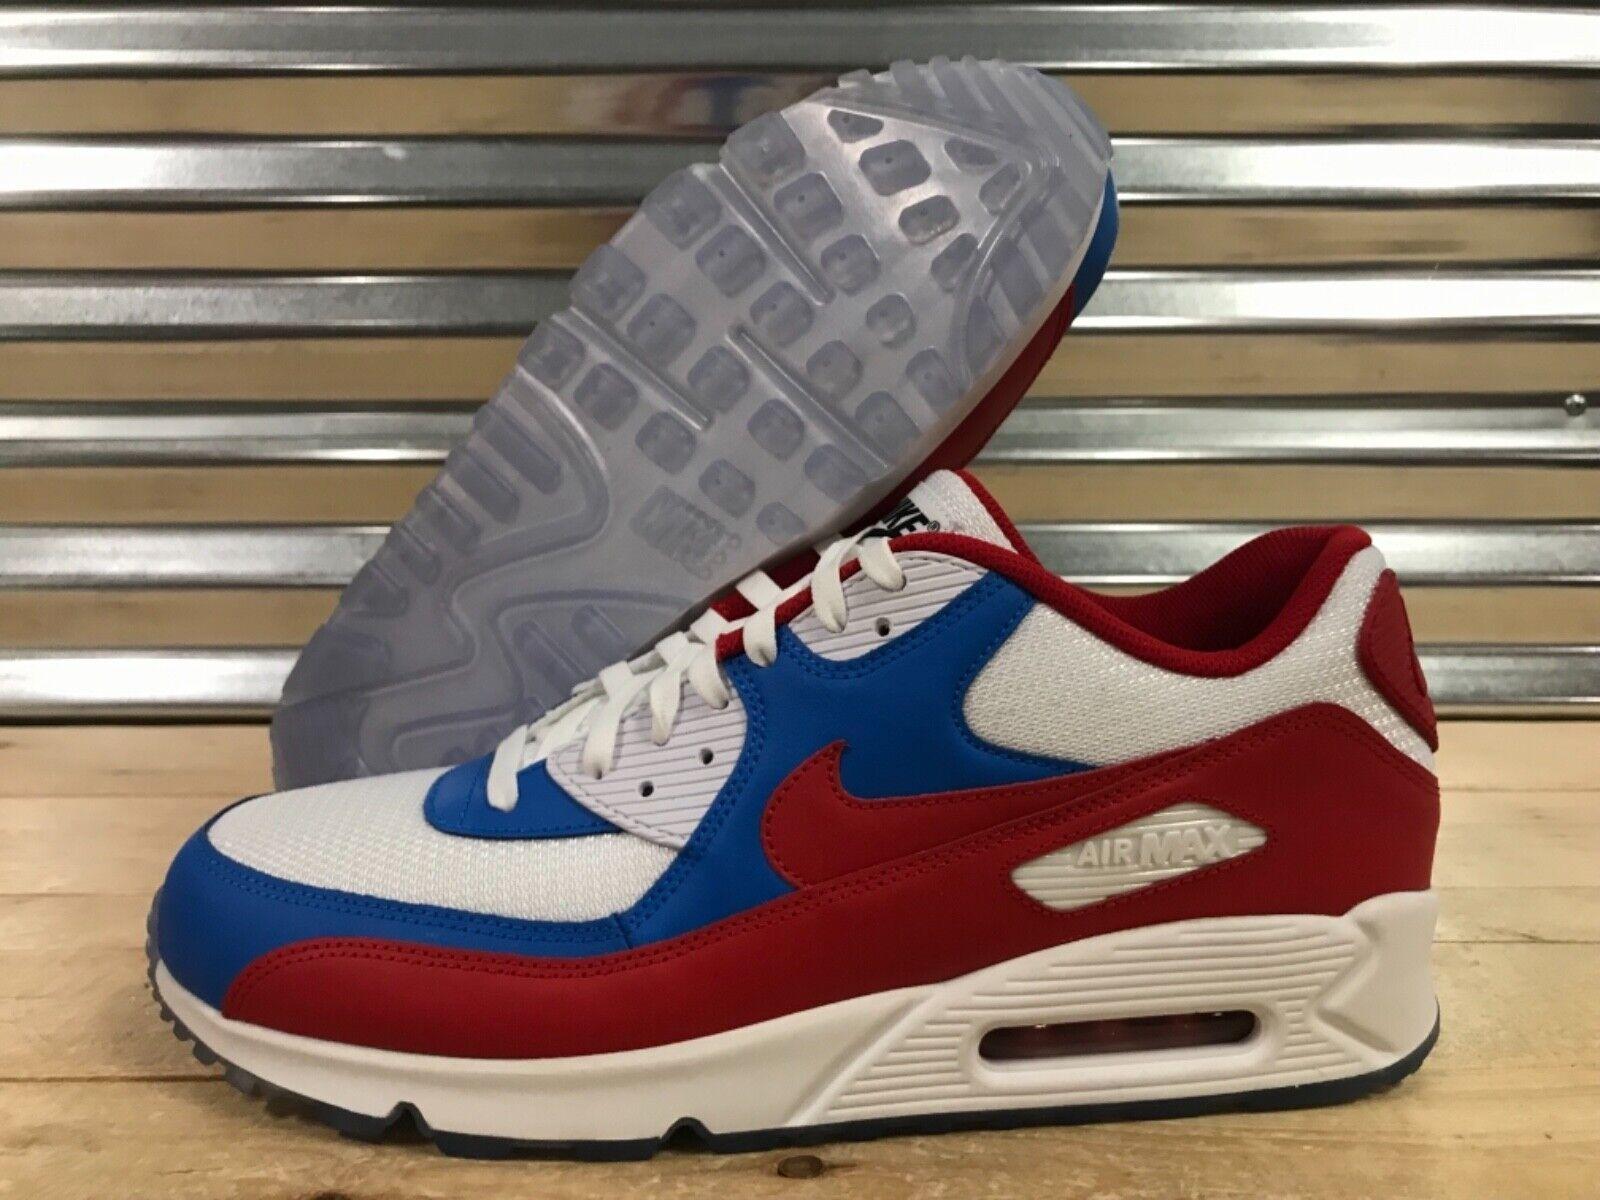 Nike Air Max 90 iD Running shoes White Red blueee USA SZ 15 ( BQ8747-991 )